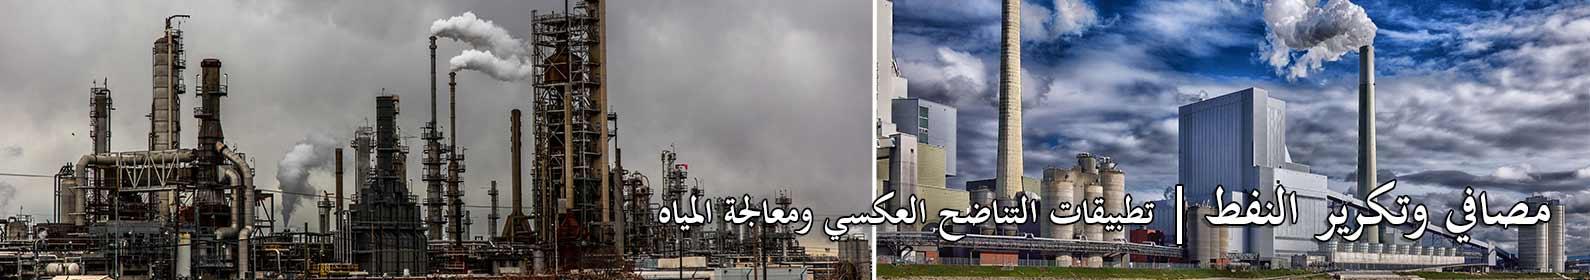 -refinery-industry.jpg